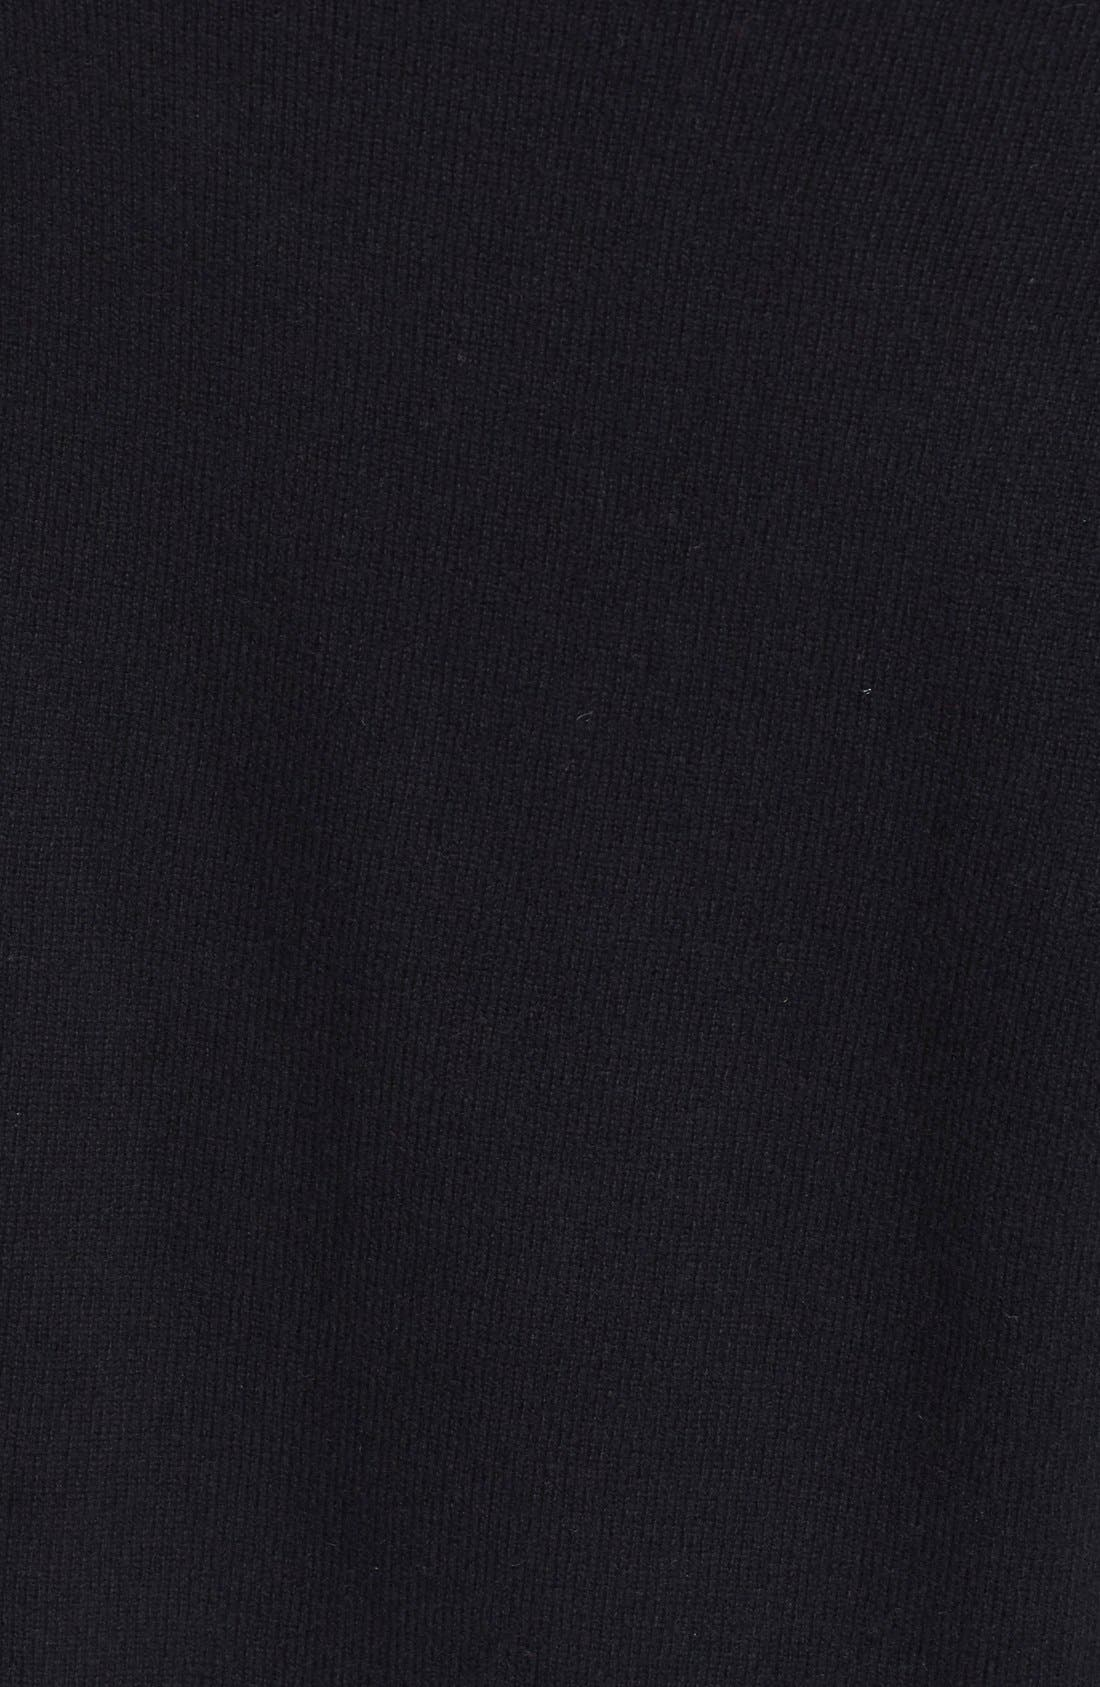 VINCE,                             Cashmere Off the Shoulder Pullover,                             Alternate thumbnail 5, color,                             001